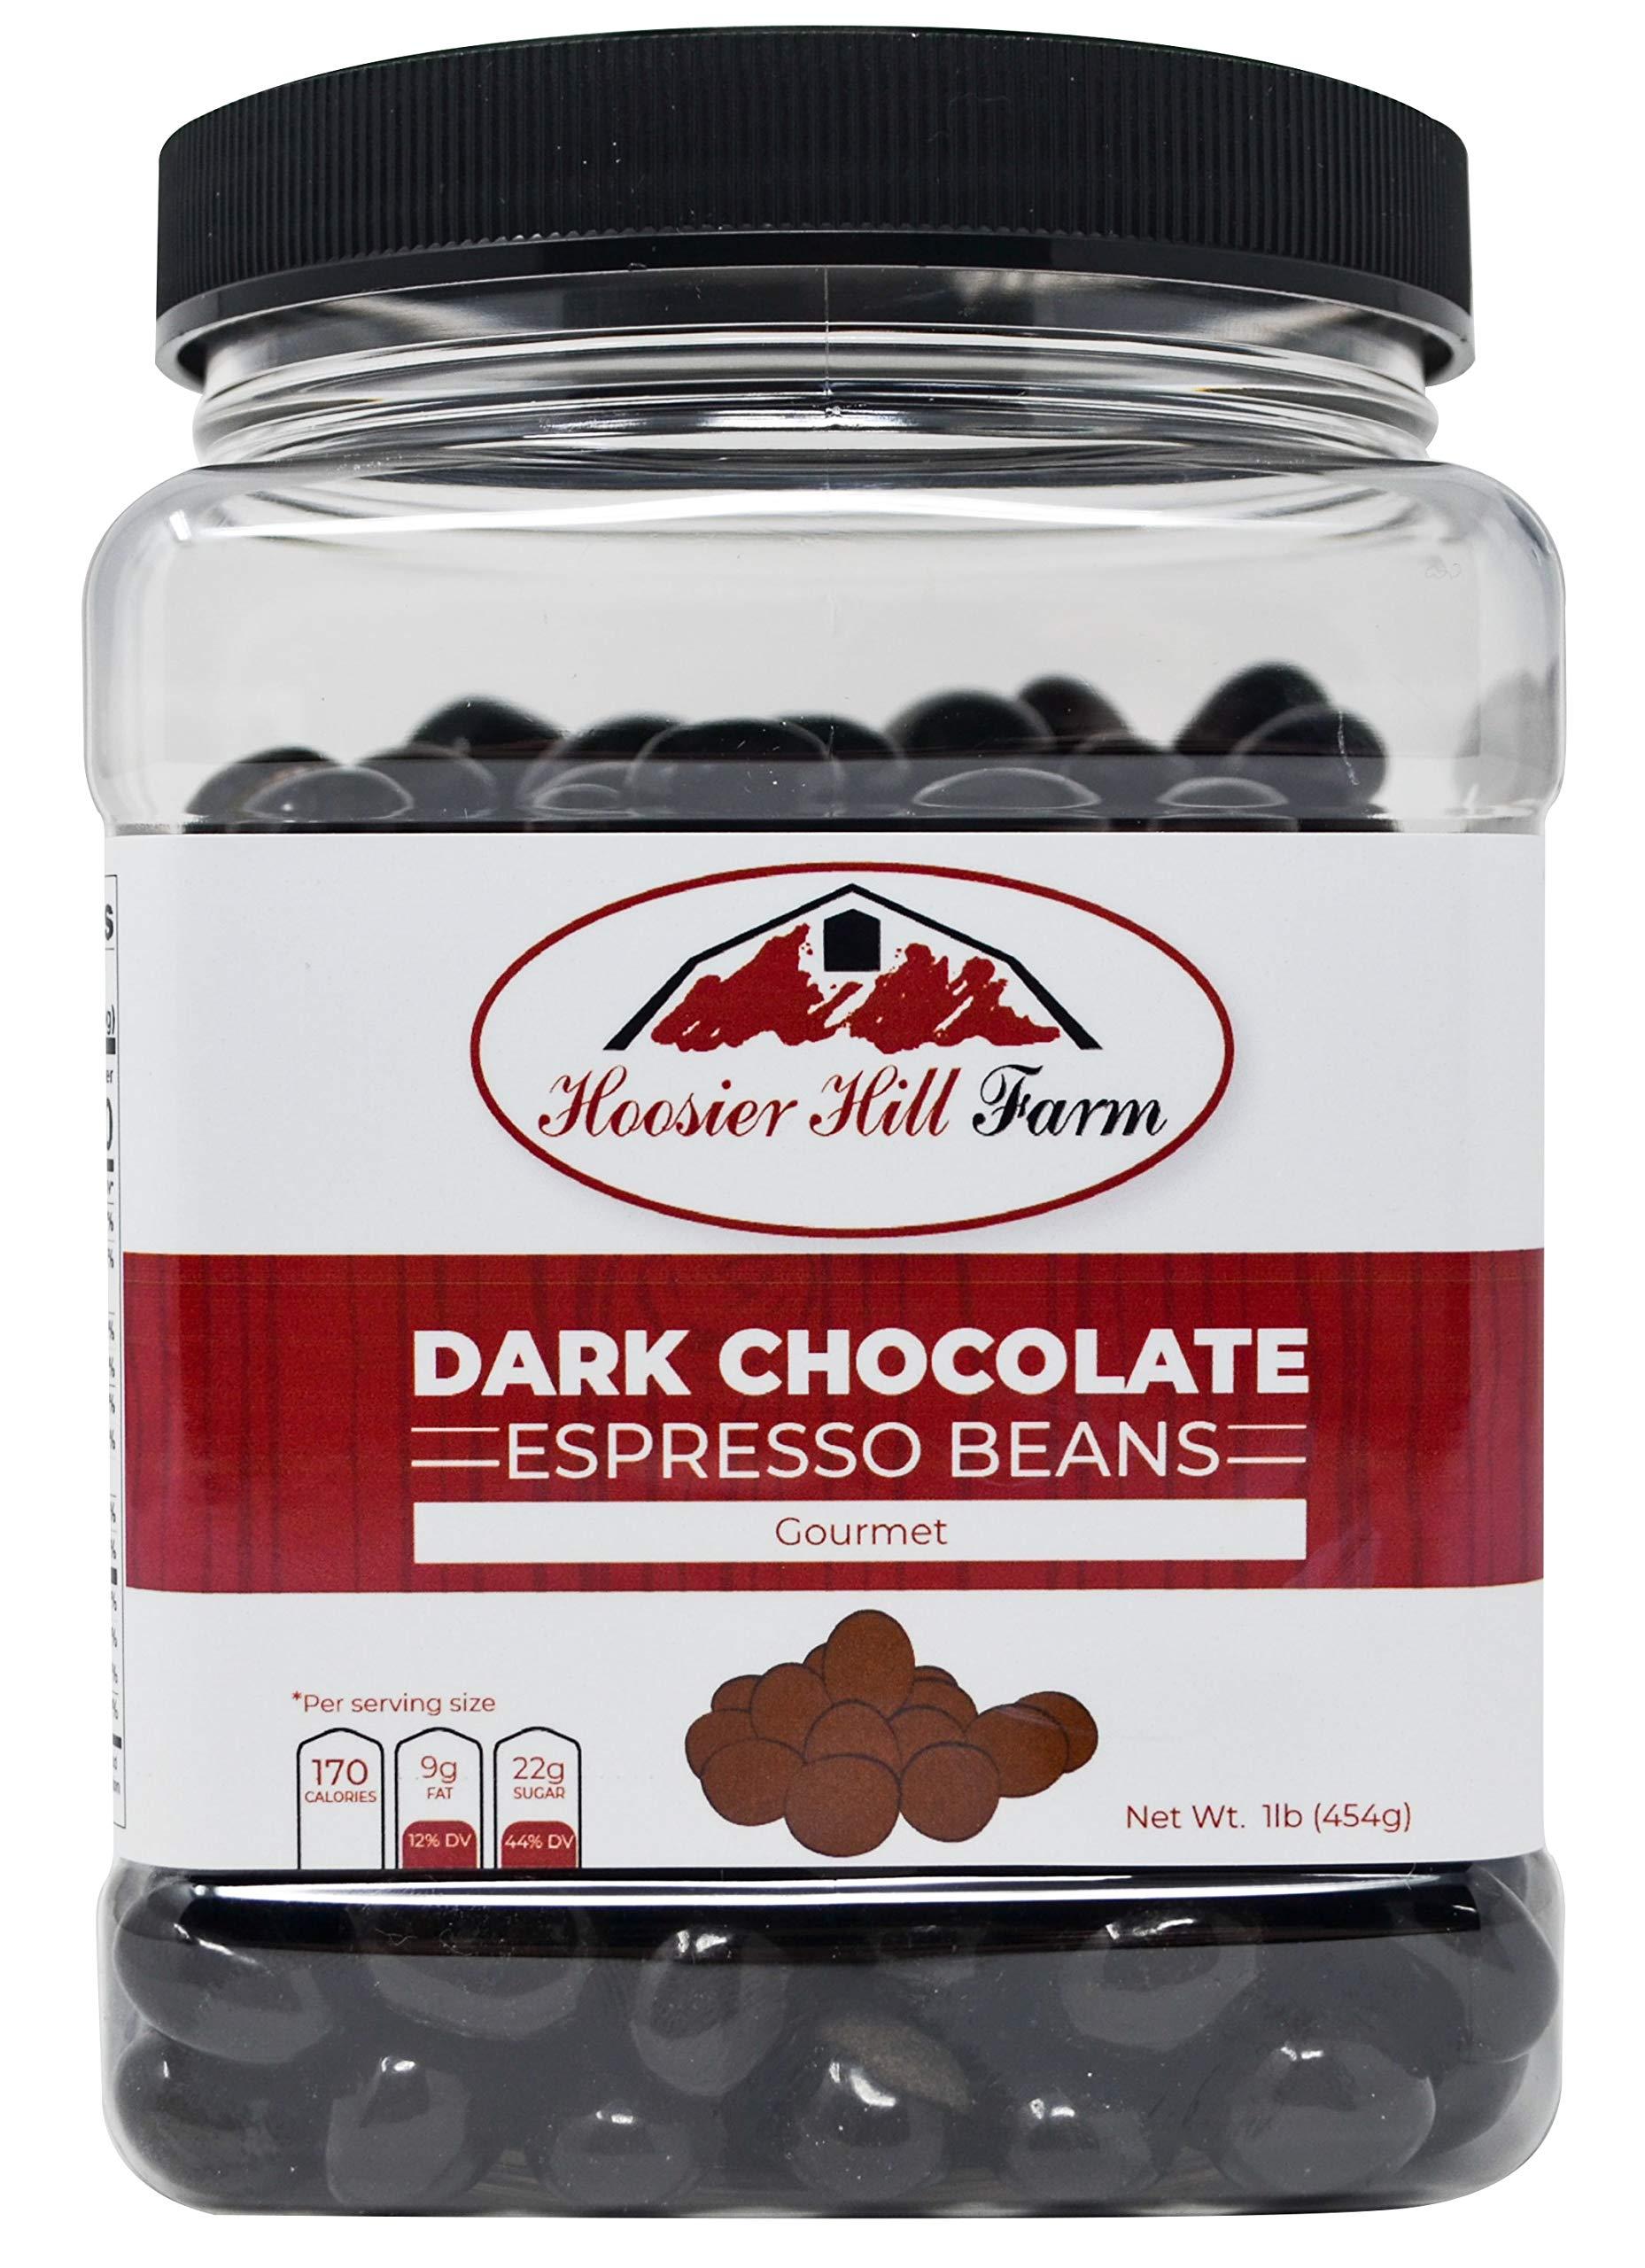 Hoosier Hill Farm Gourmet Dark Chocolate Espresso Beans, 16 Ounce